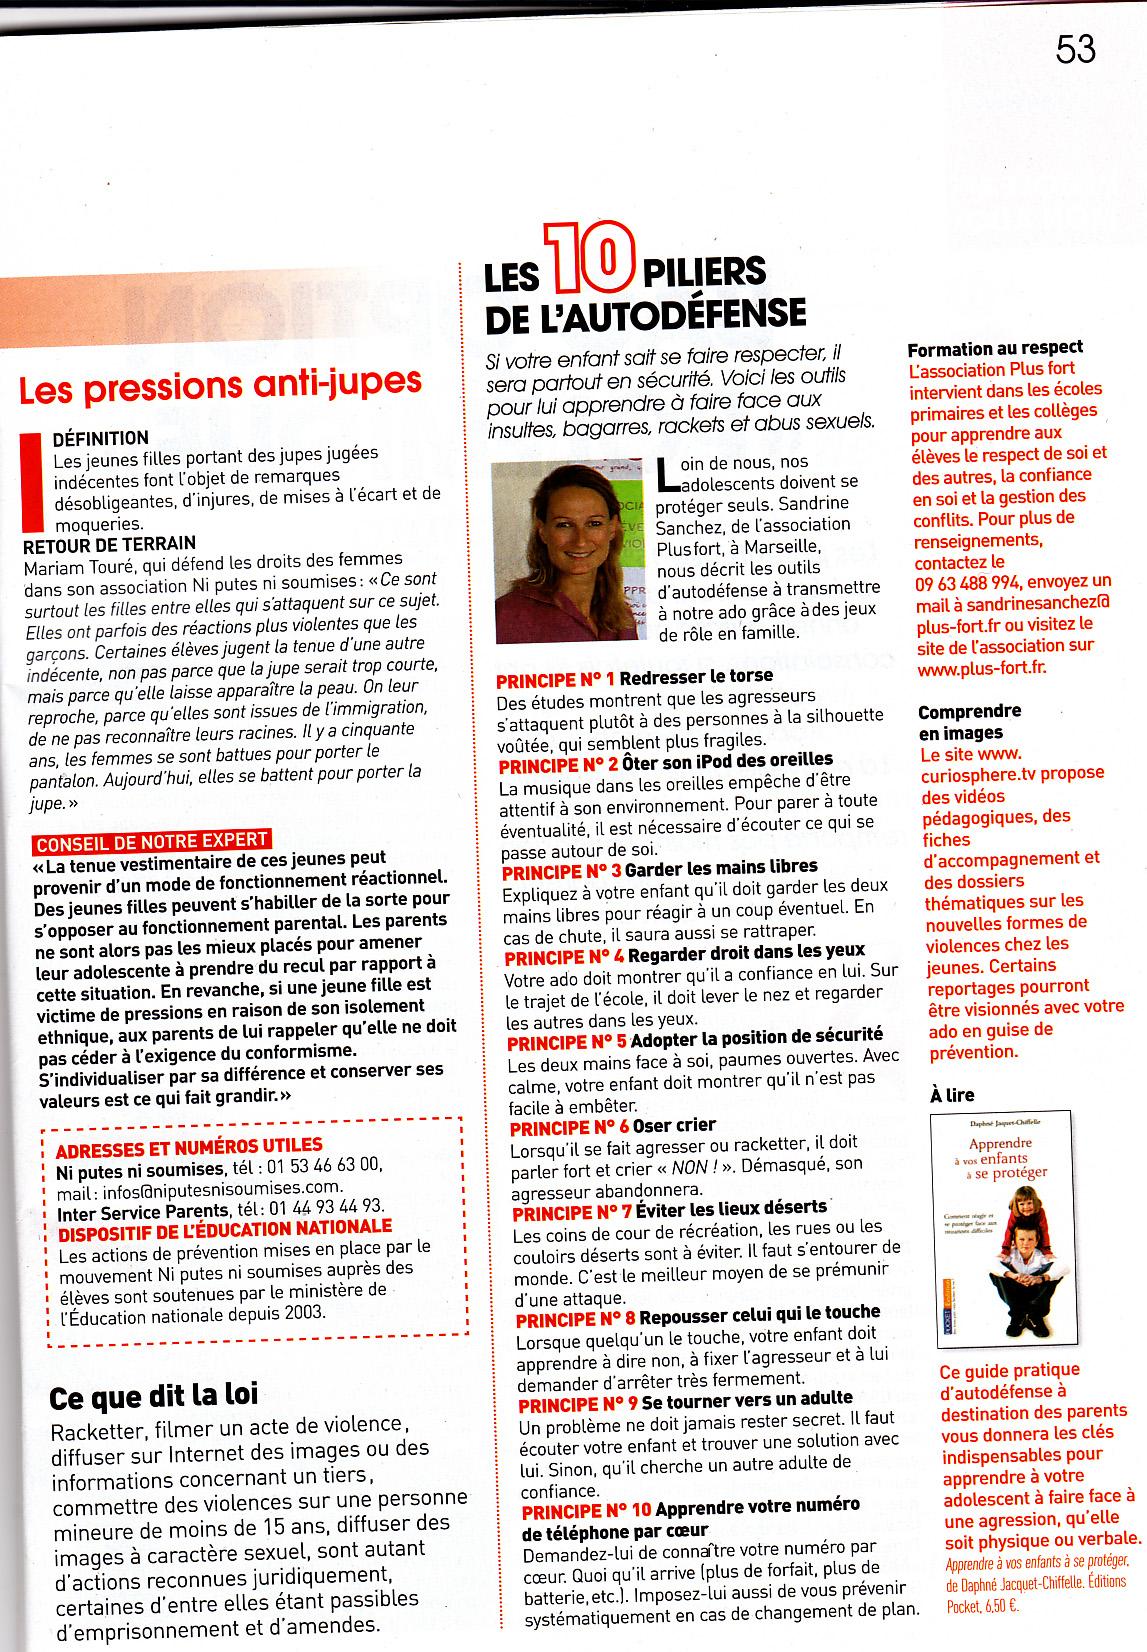 2009 11 Pédagogie Magazine p 53